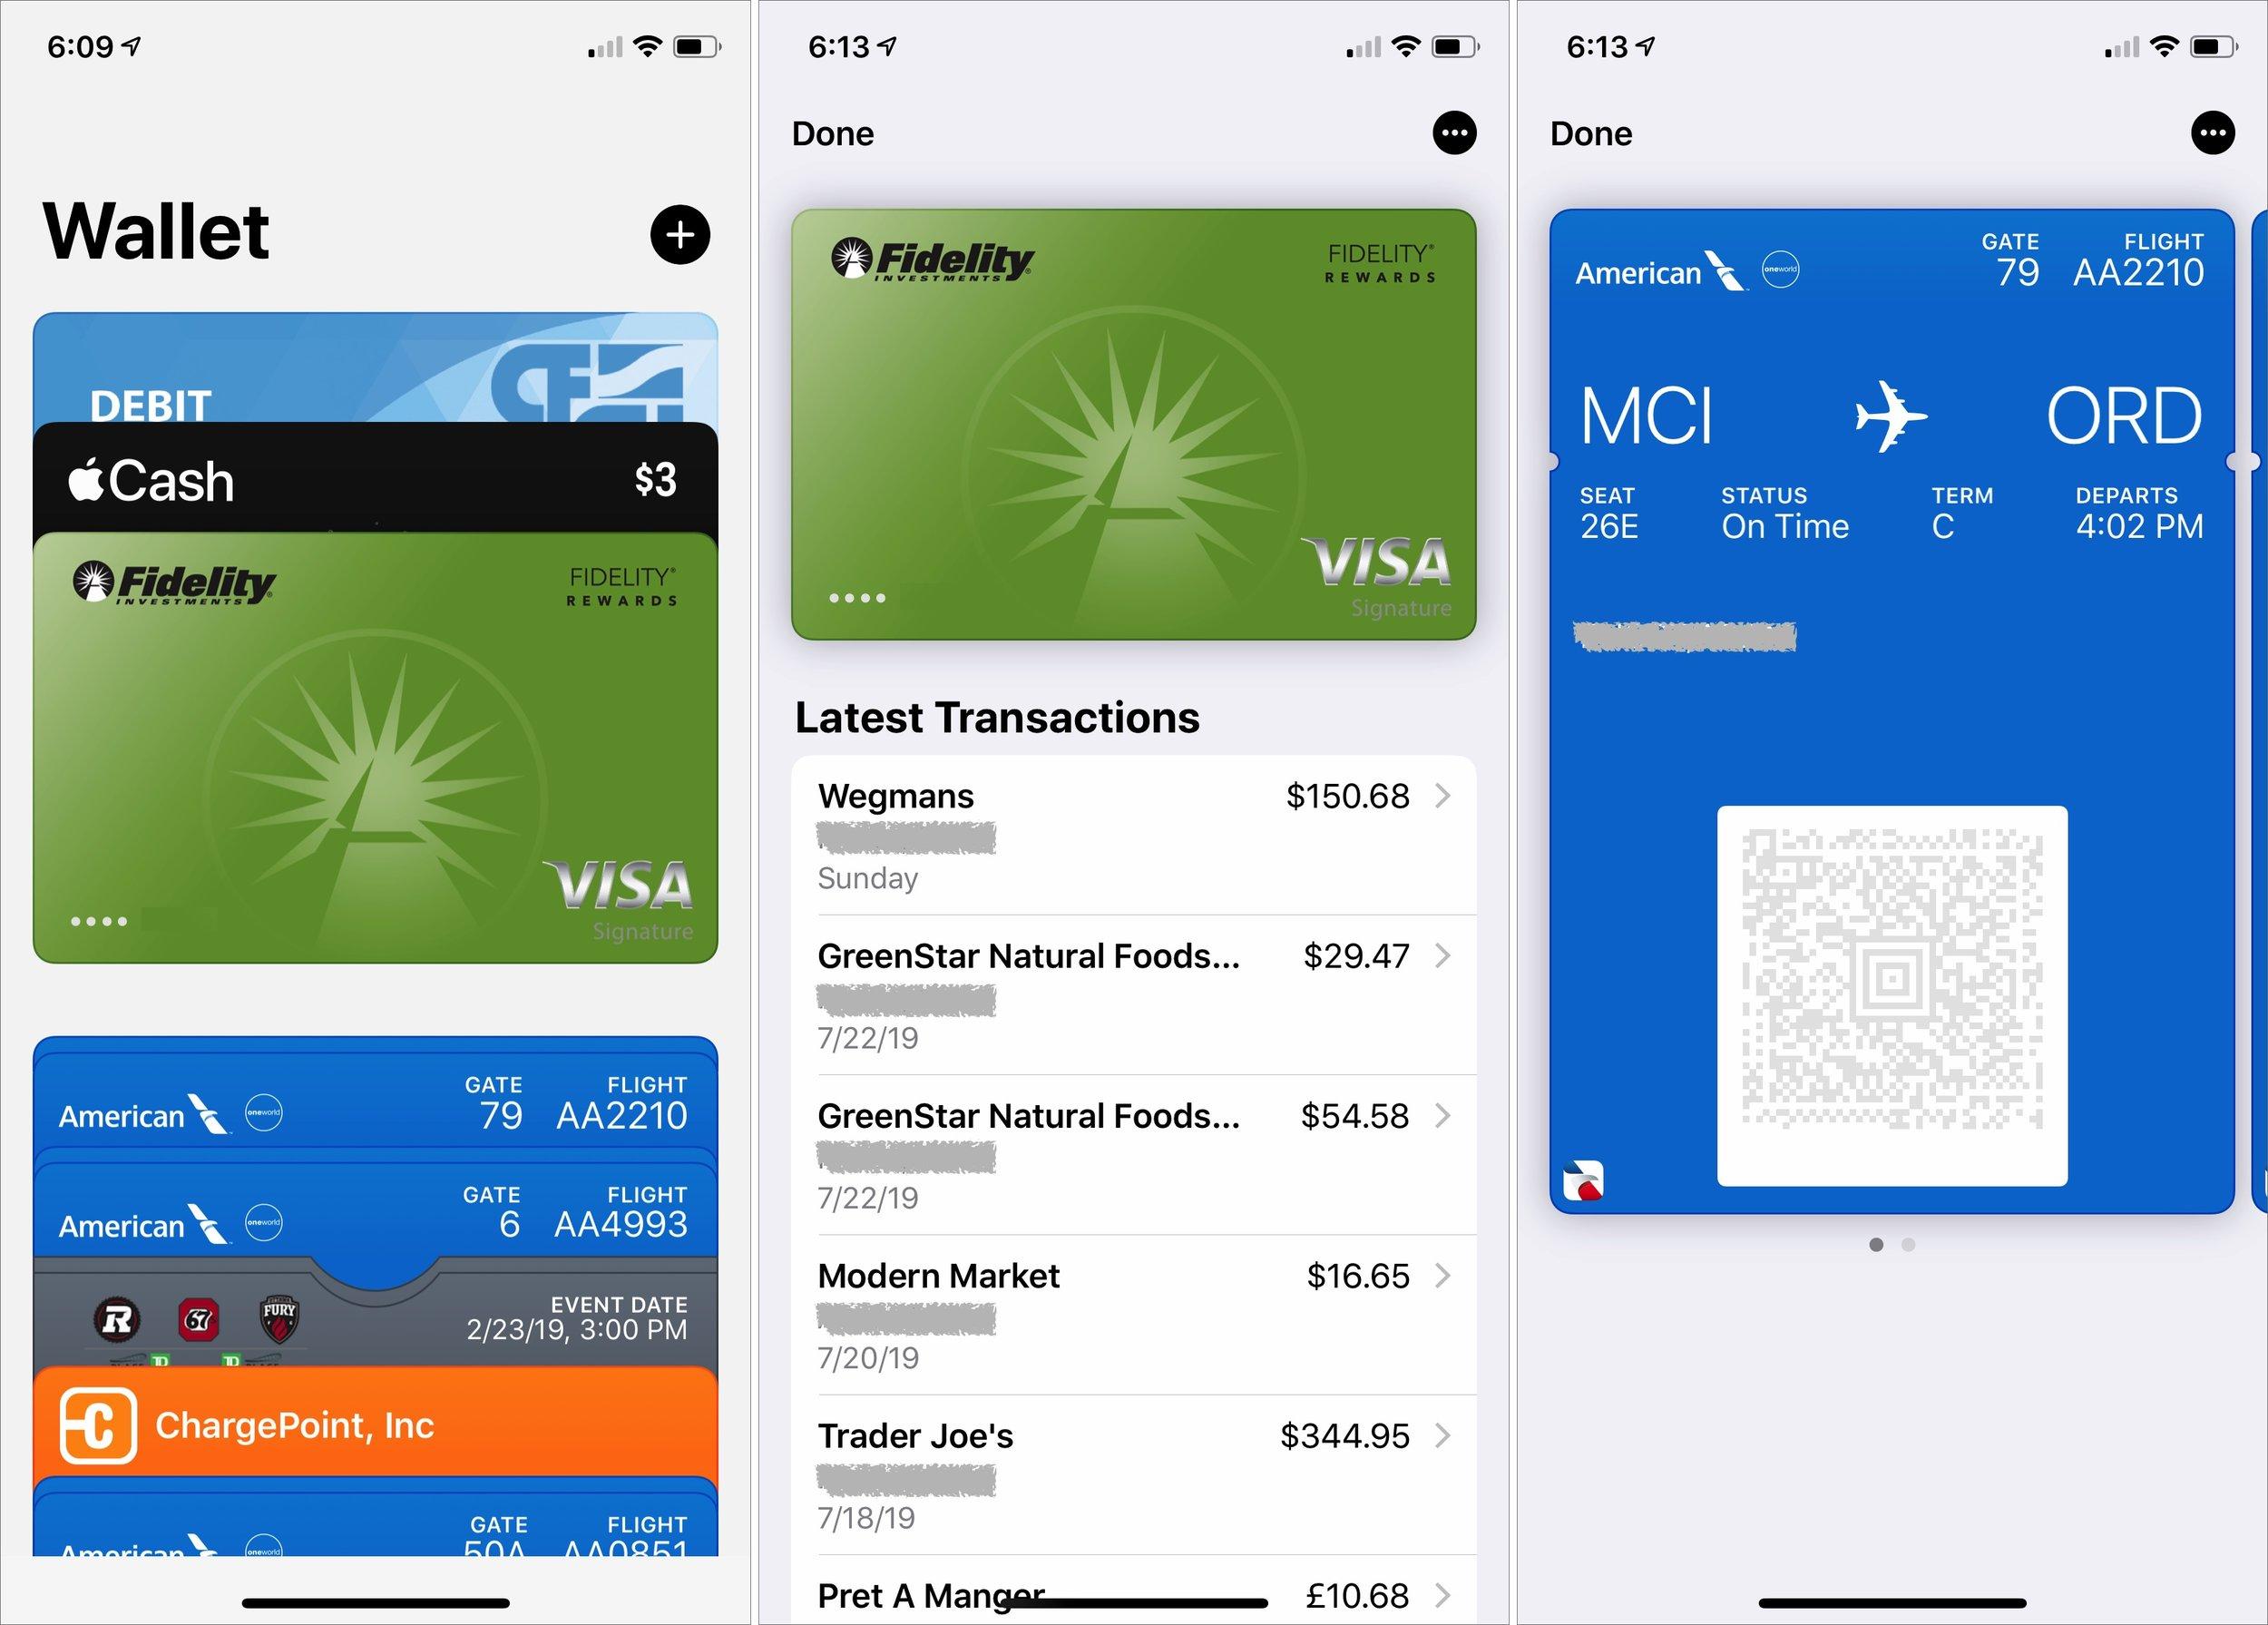 Wallet-main-and-detail.jpg